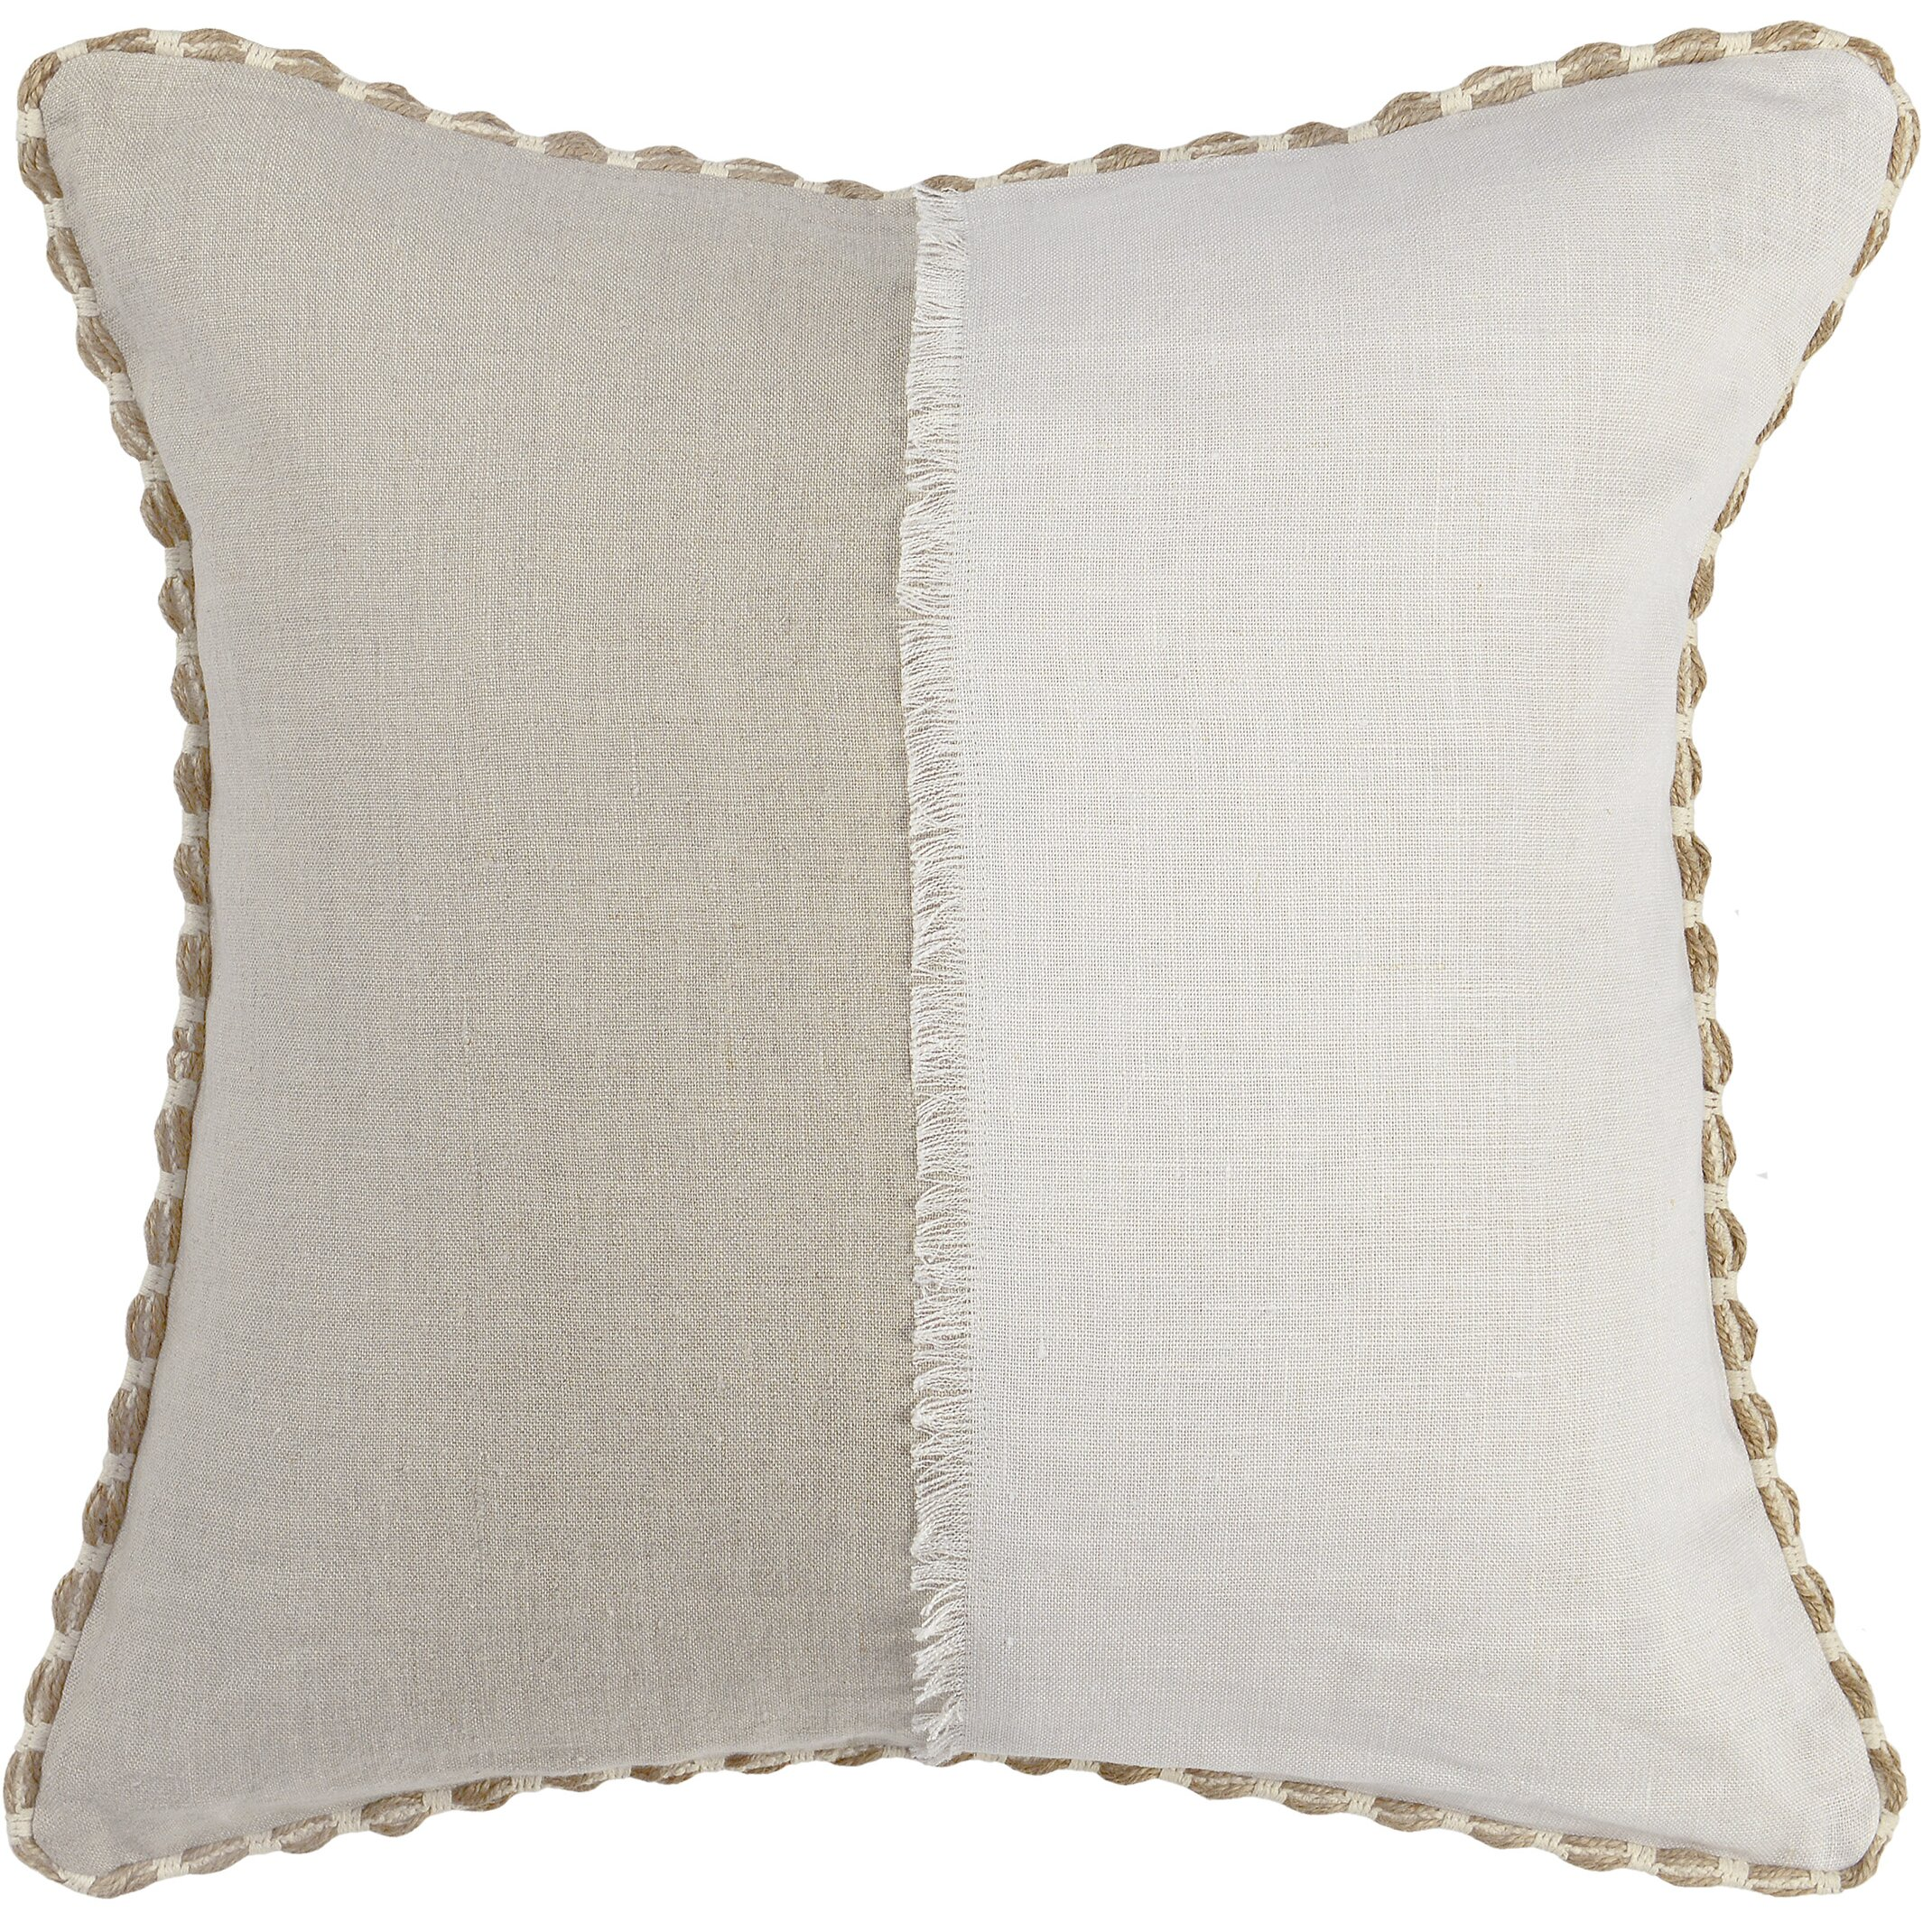 Lavender Throw Pillows : One Allium Way Champaign Linen Throw Pillow Wayfair